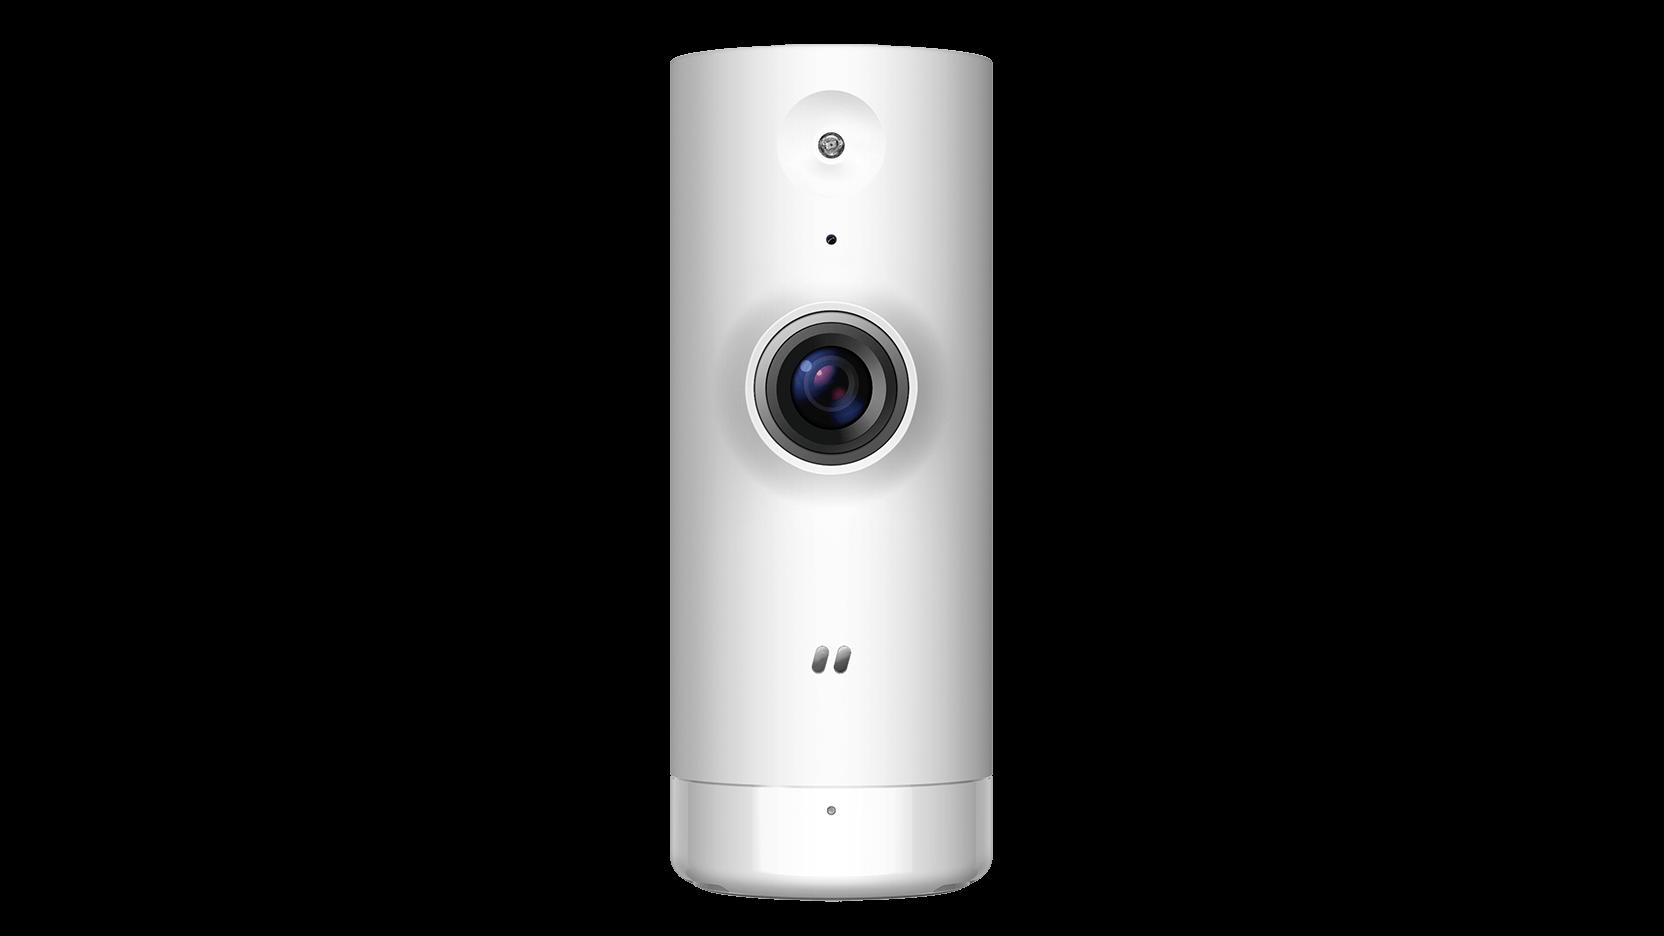 Economica videocamera D-Link DCS-8000LH: da Trony scontata a 39 euro